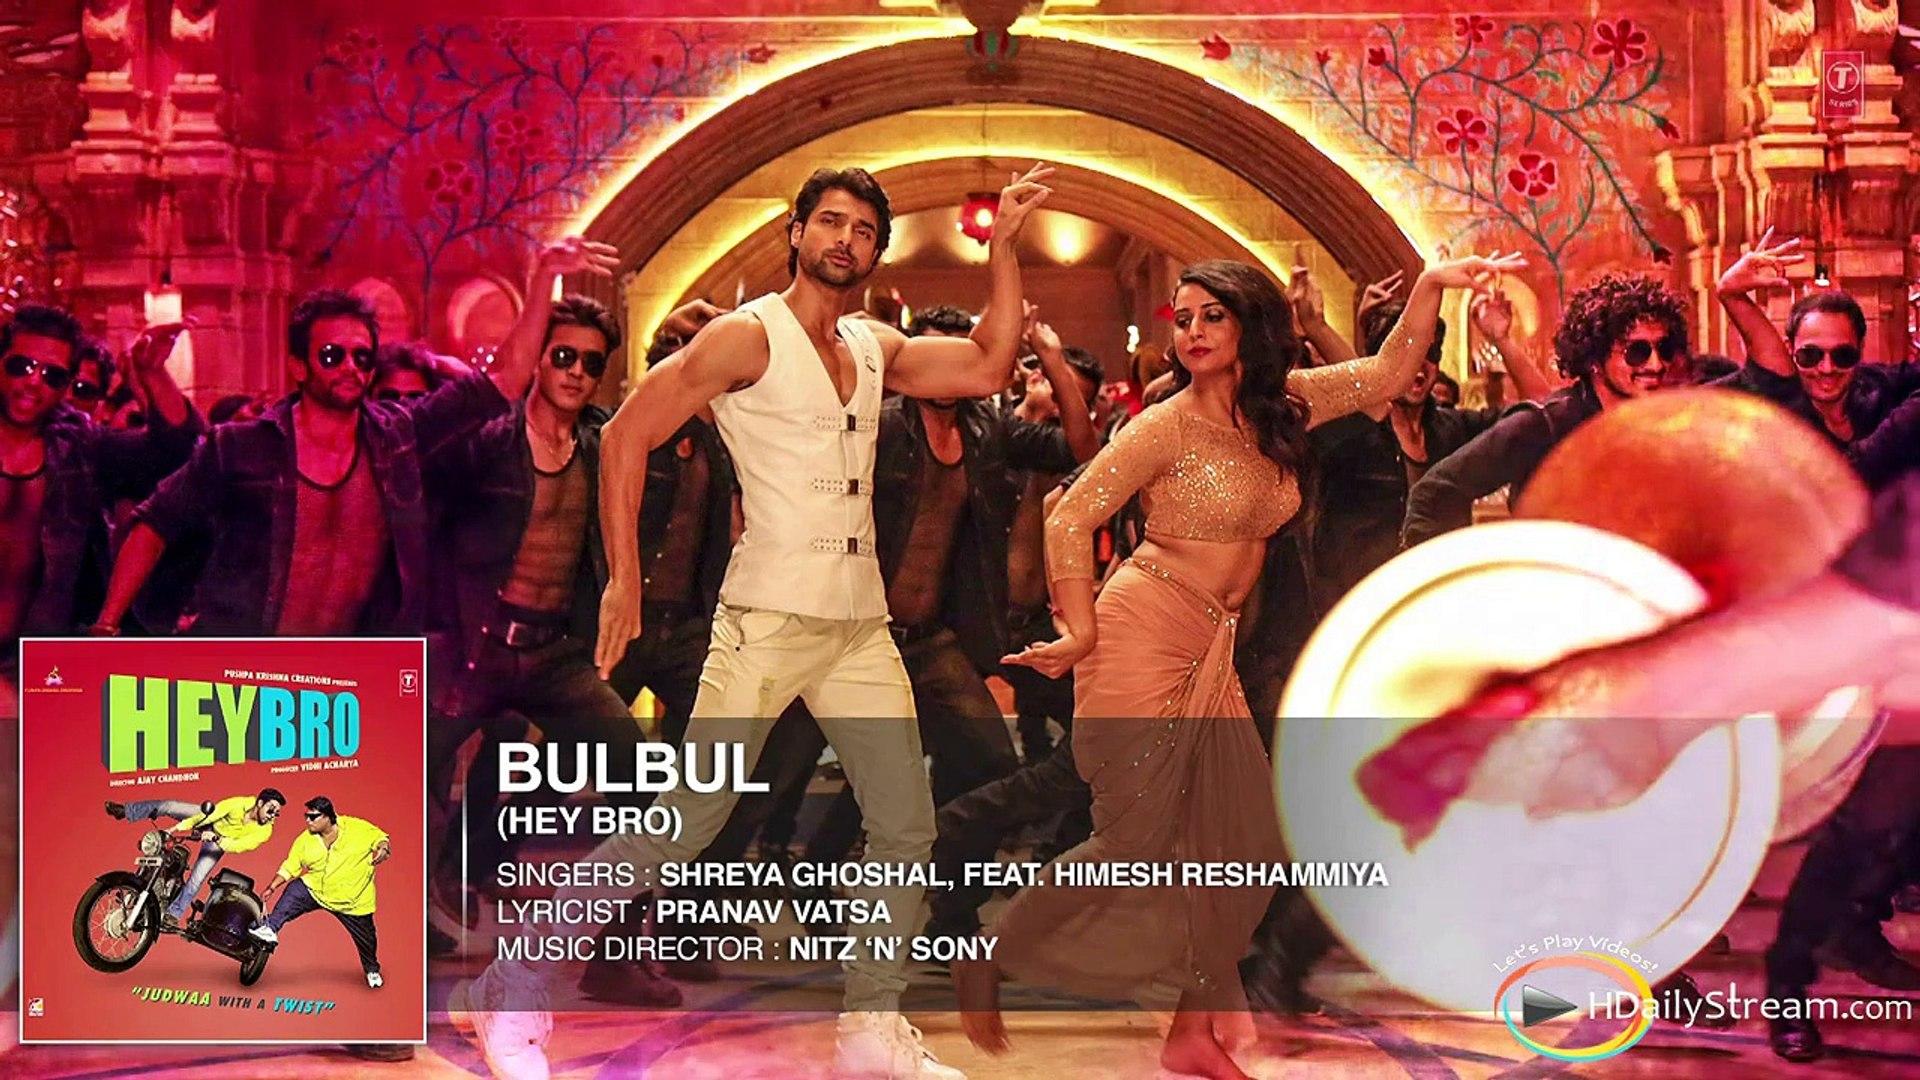 'Bulbul' Full Song (Audio) - Hey Bro - Shreya Ghoshal, Feat. Himesh Reshammiya - Ganesh Ac